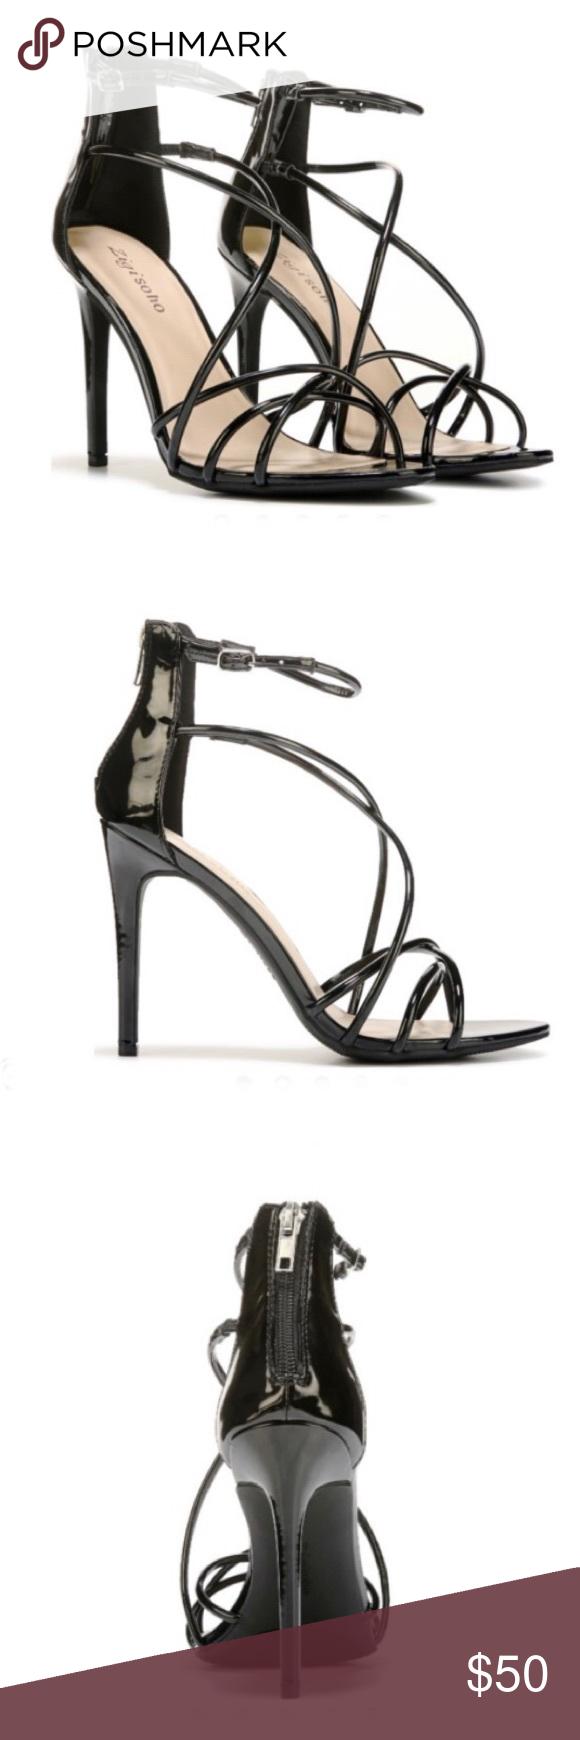 a55fadc4f572 Zigi Soho Black Blaker Dress Sandals-10 NWT You ll shine at your next